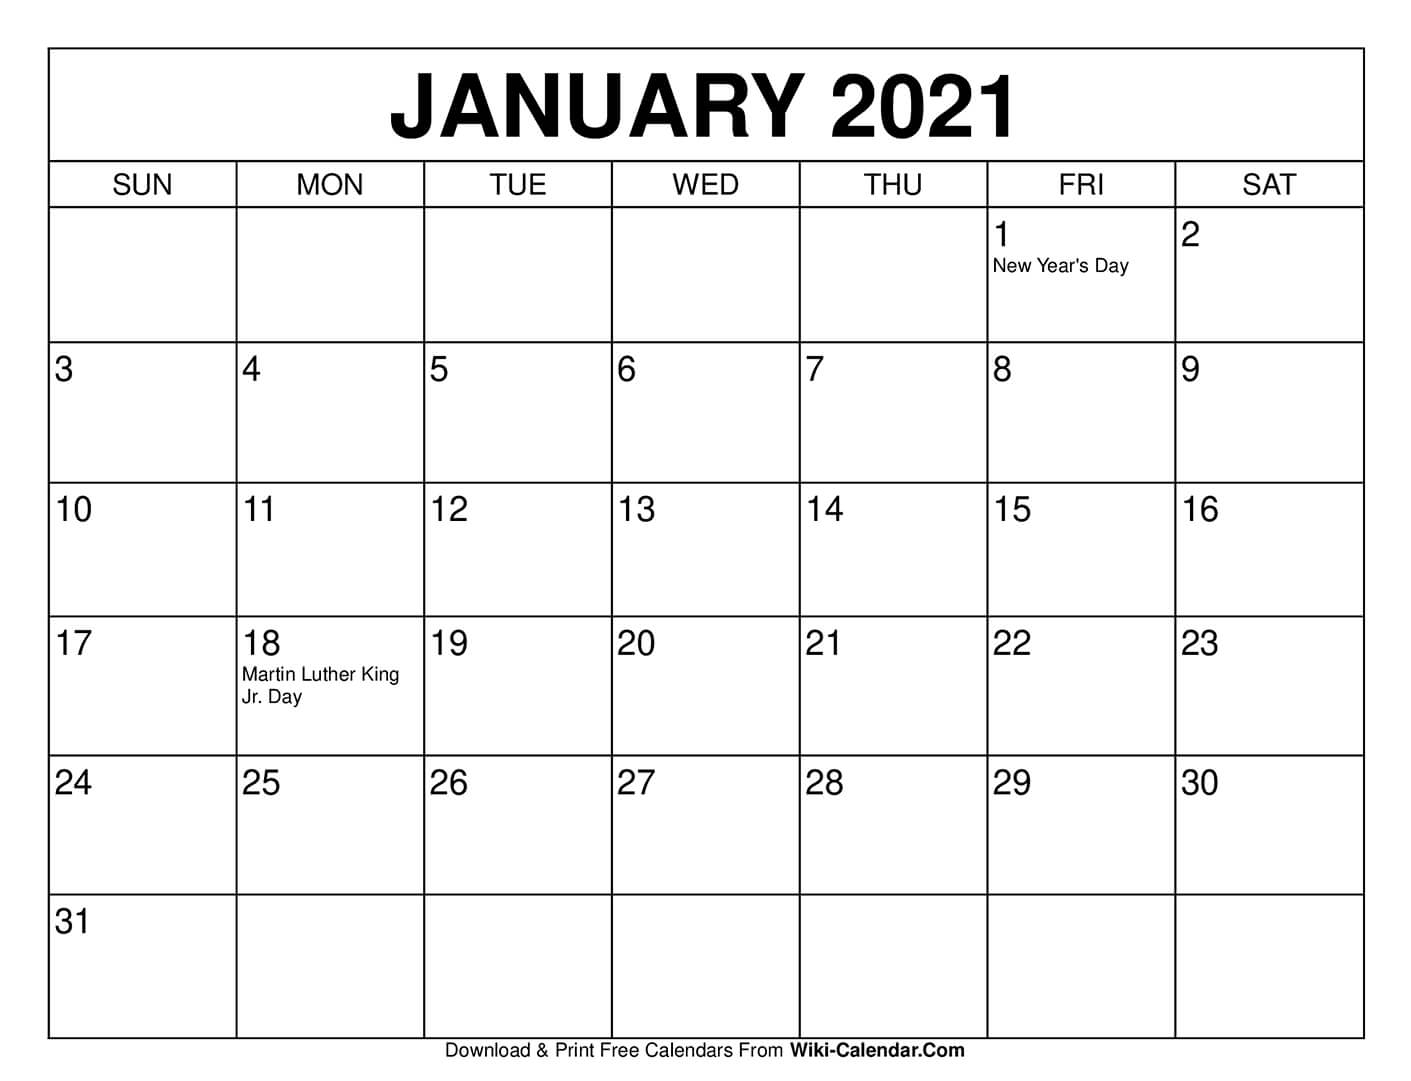 Free Printable January 2021 Calendars in Printable Fill In Calendar 2021